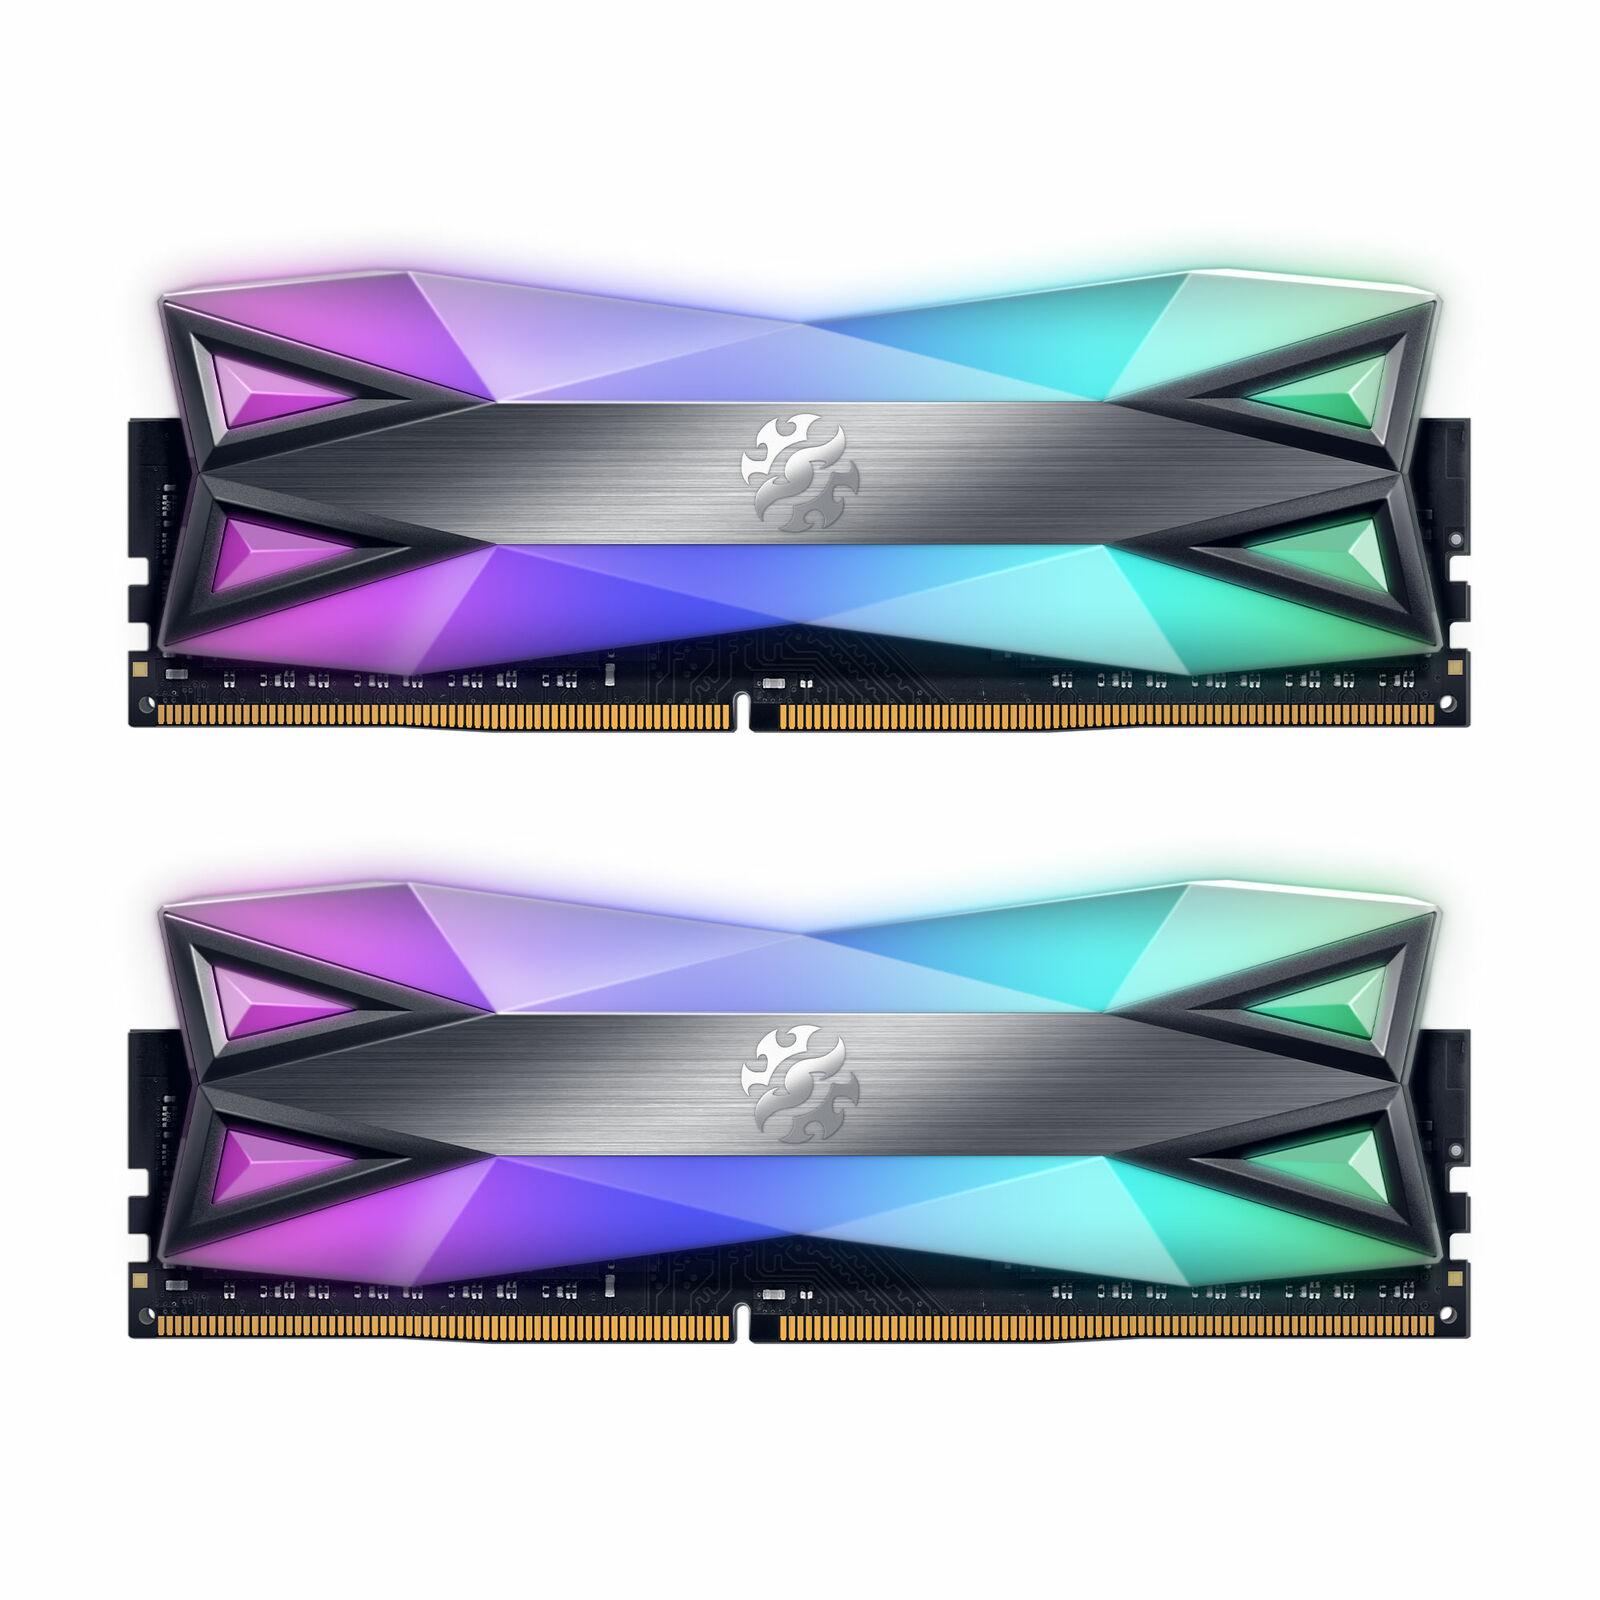 XPG SPECTRIX D60G RGB Desktop Memory Series: 16GB (2x8GB) DDR4 3600MHz CL18 GREY. Buy it now for 109.99